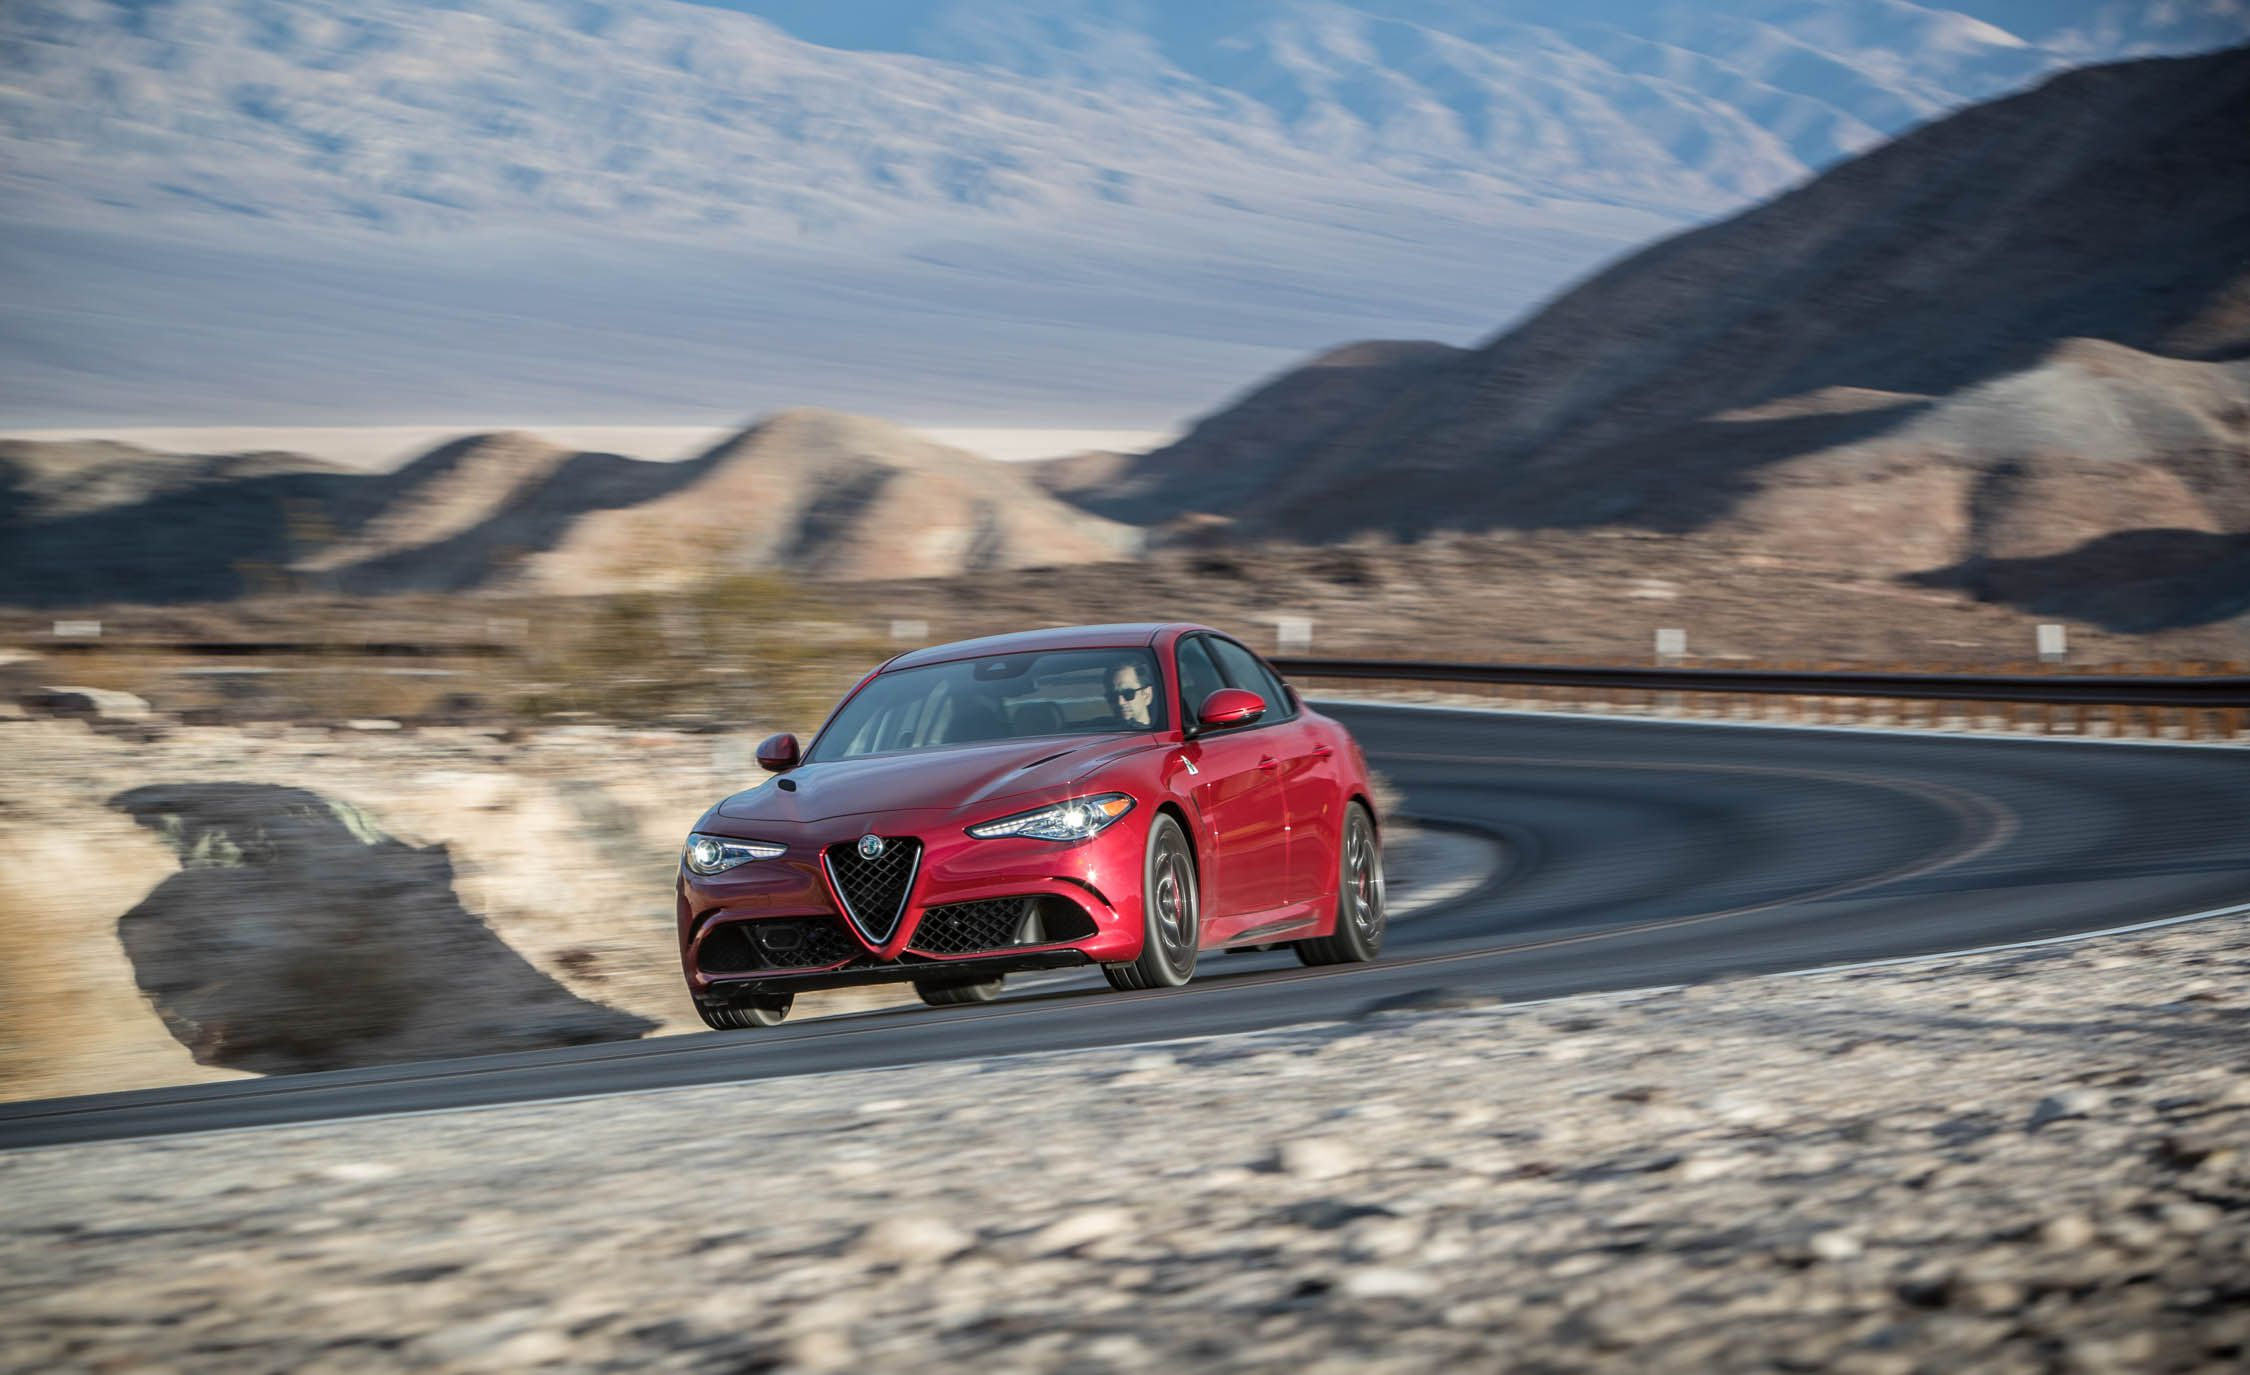 2017 Alfa Romeo Giulia Quadrifoglio – Instrumented Test